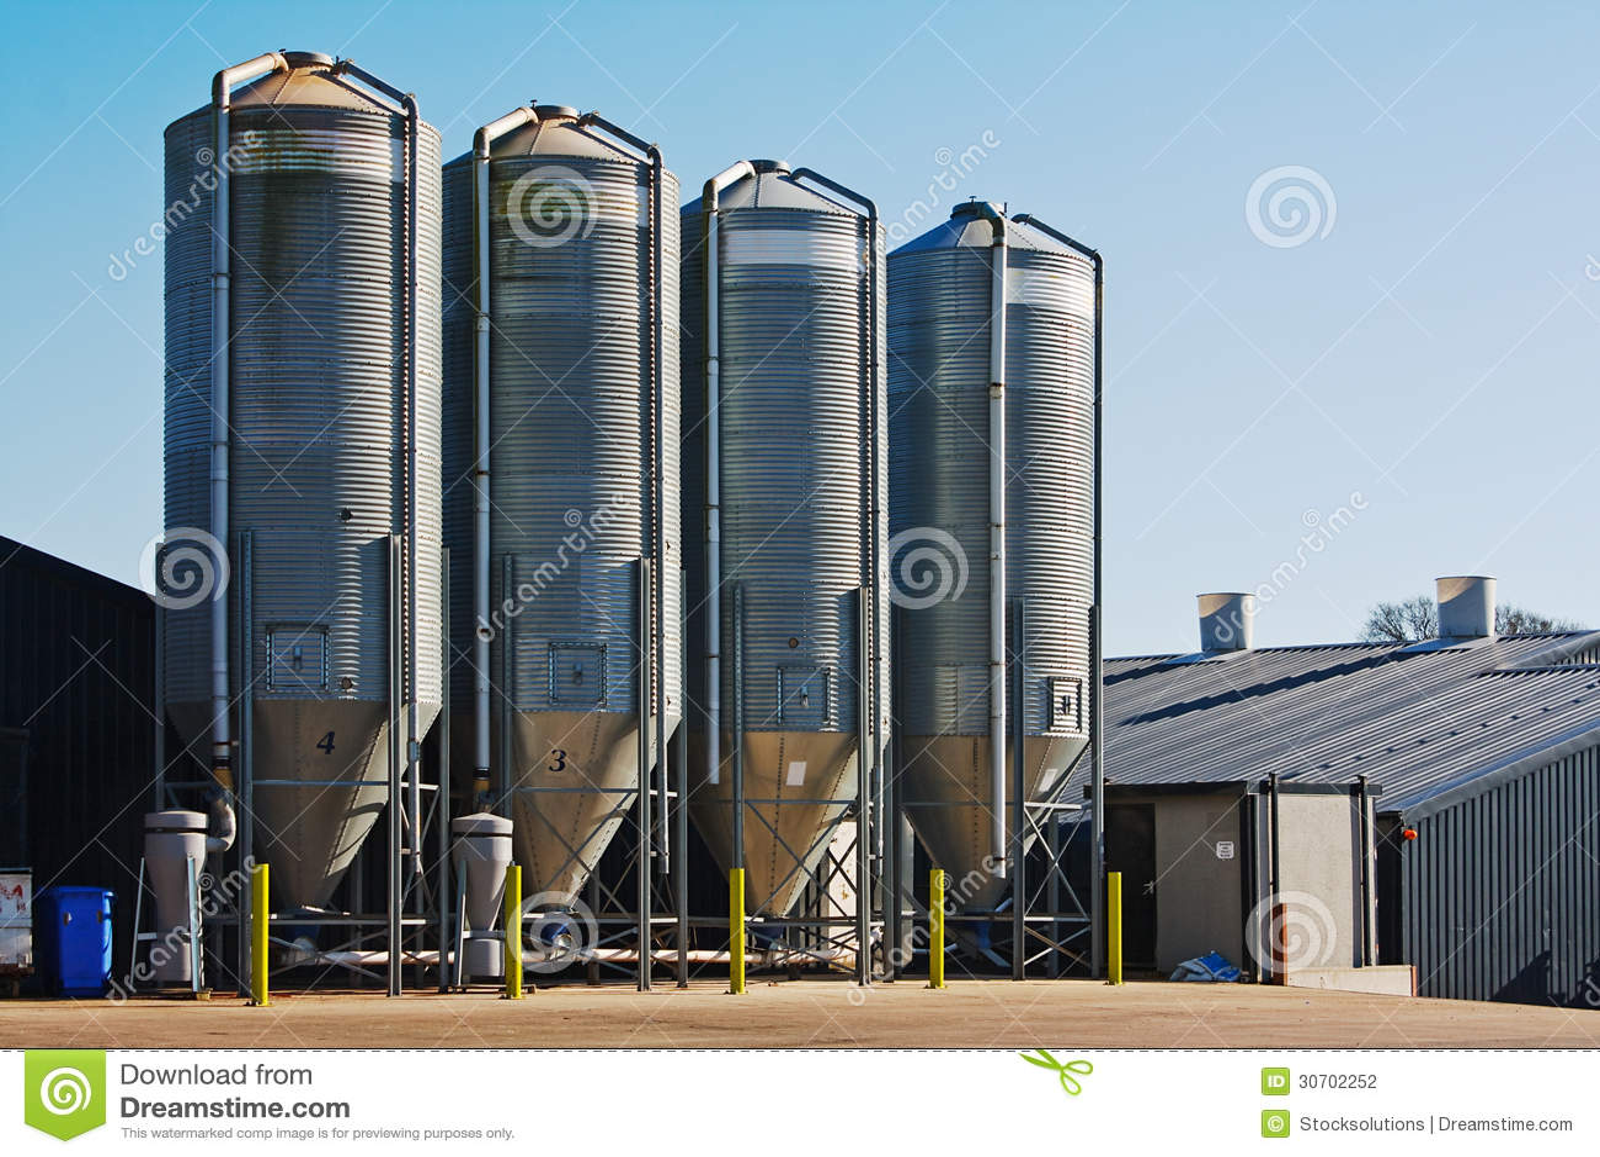 Farm Grain Worksheet